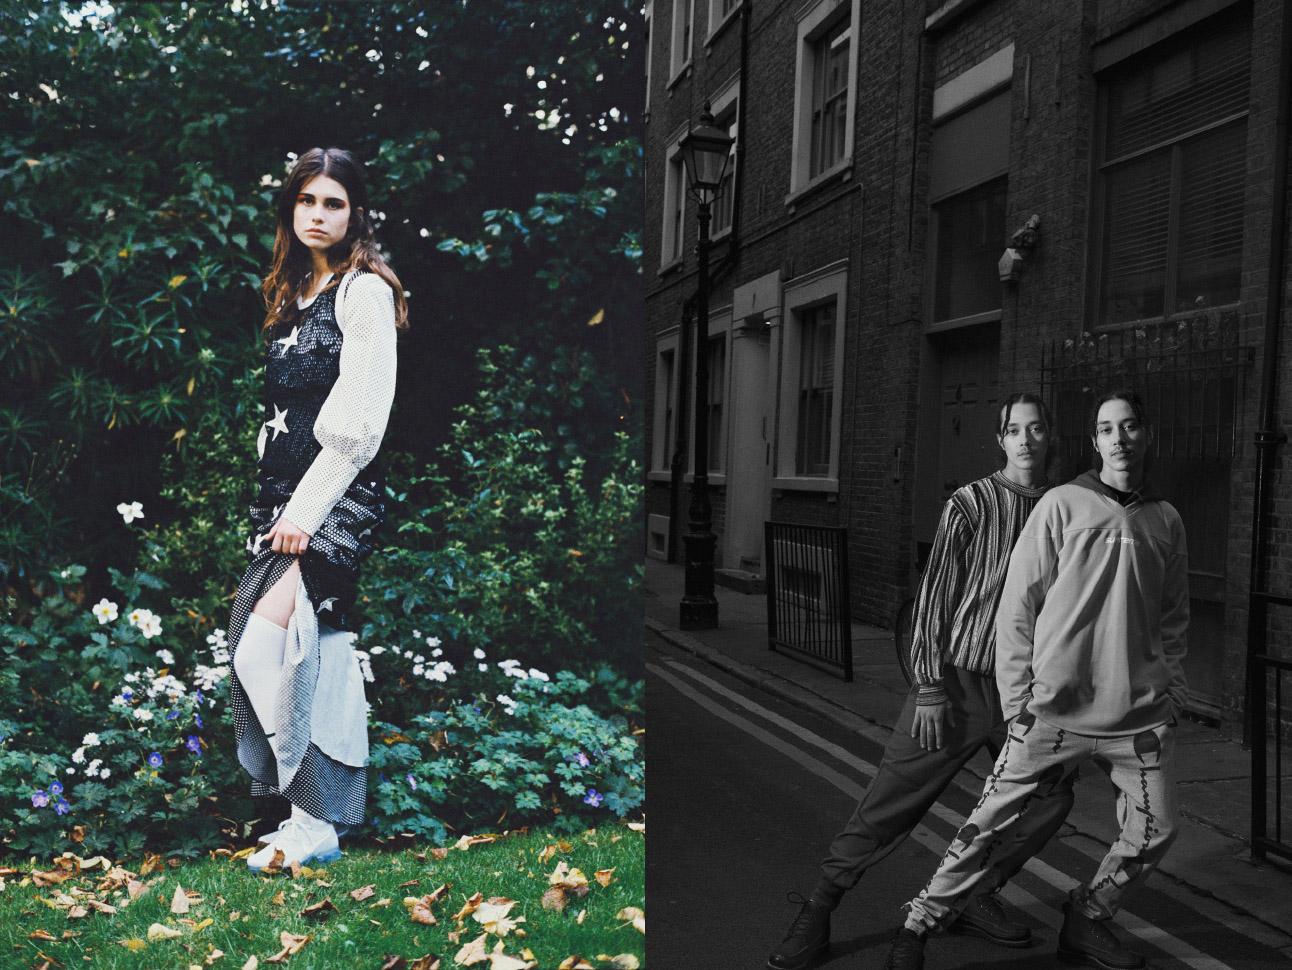 star vest   THEORY     dress   HOUSE OF HOLLAND   socks   NIKE     trainers   NIKE  . sweater     COOGI     pants   Y3   ,  top   SUPREME     hoody   NIKE     pants   CHAMPION